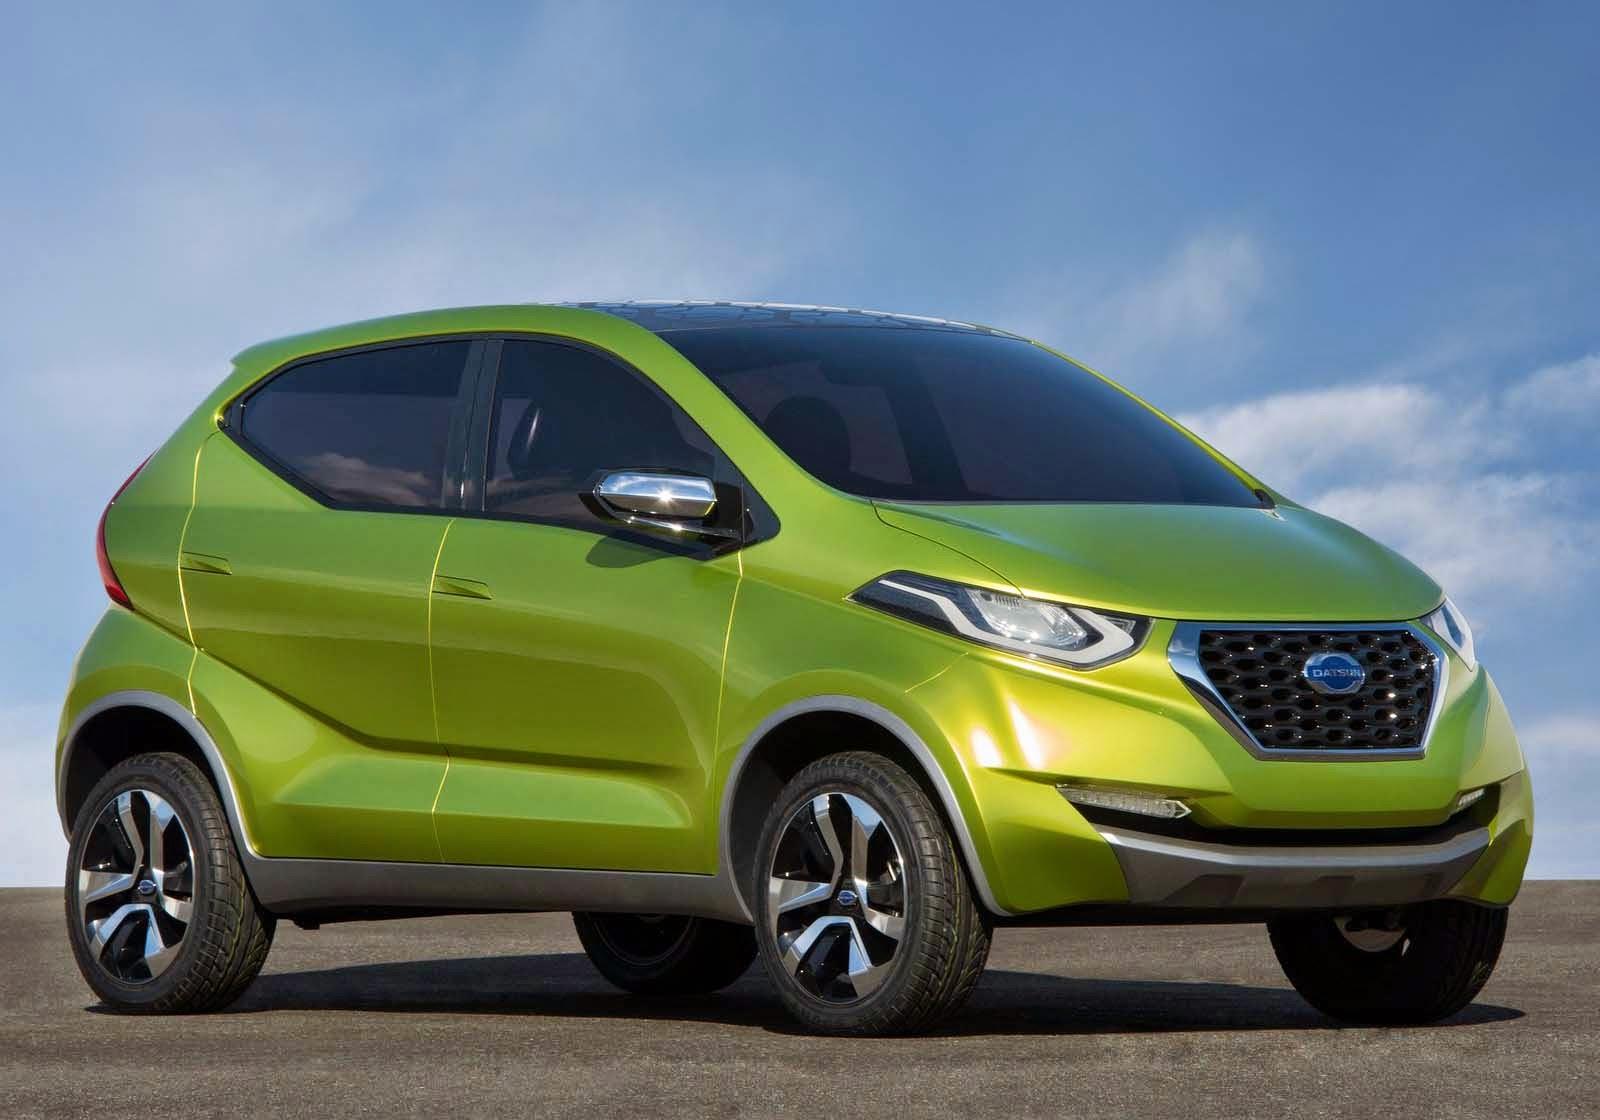 JESSLIE: Datsun Redi - GO Car Concept Modern | Specifications